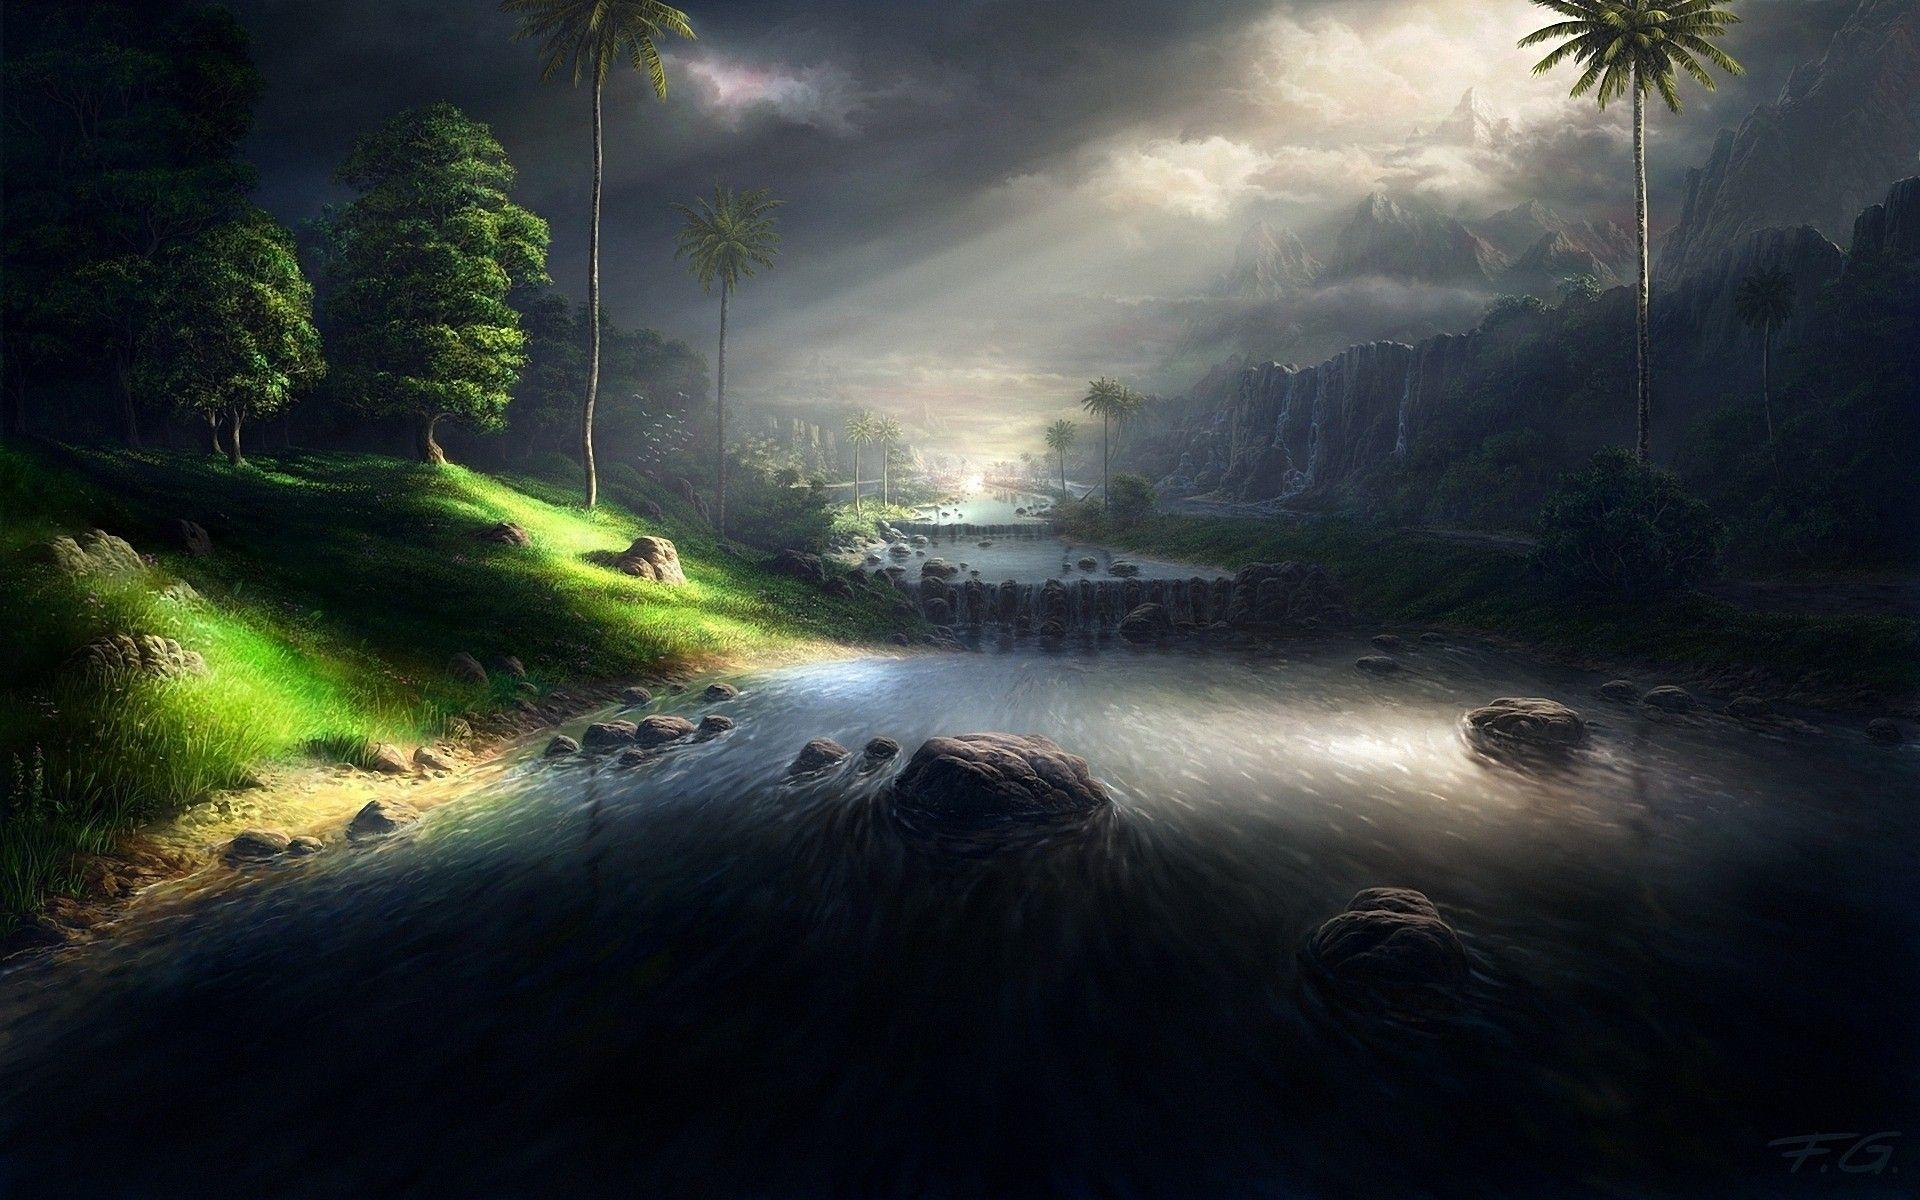 sunlit dark #river #landscape #digital #art 3d #wallpaper | 3d